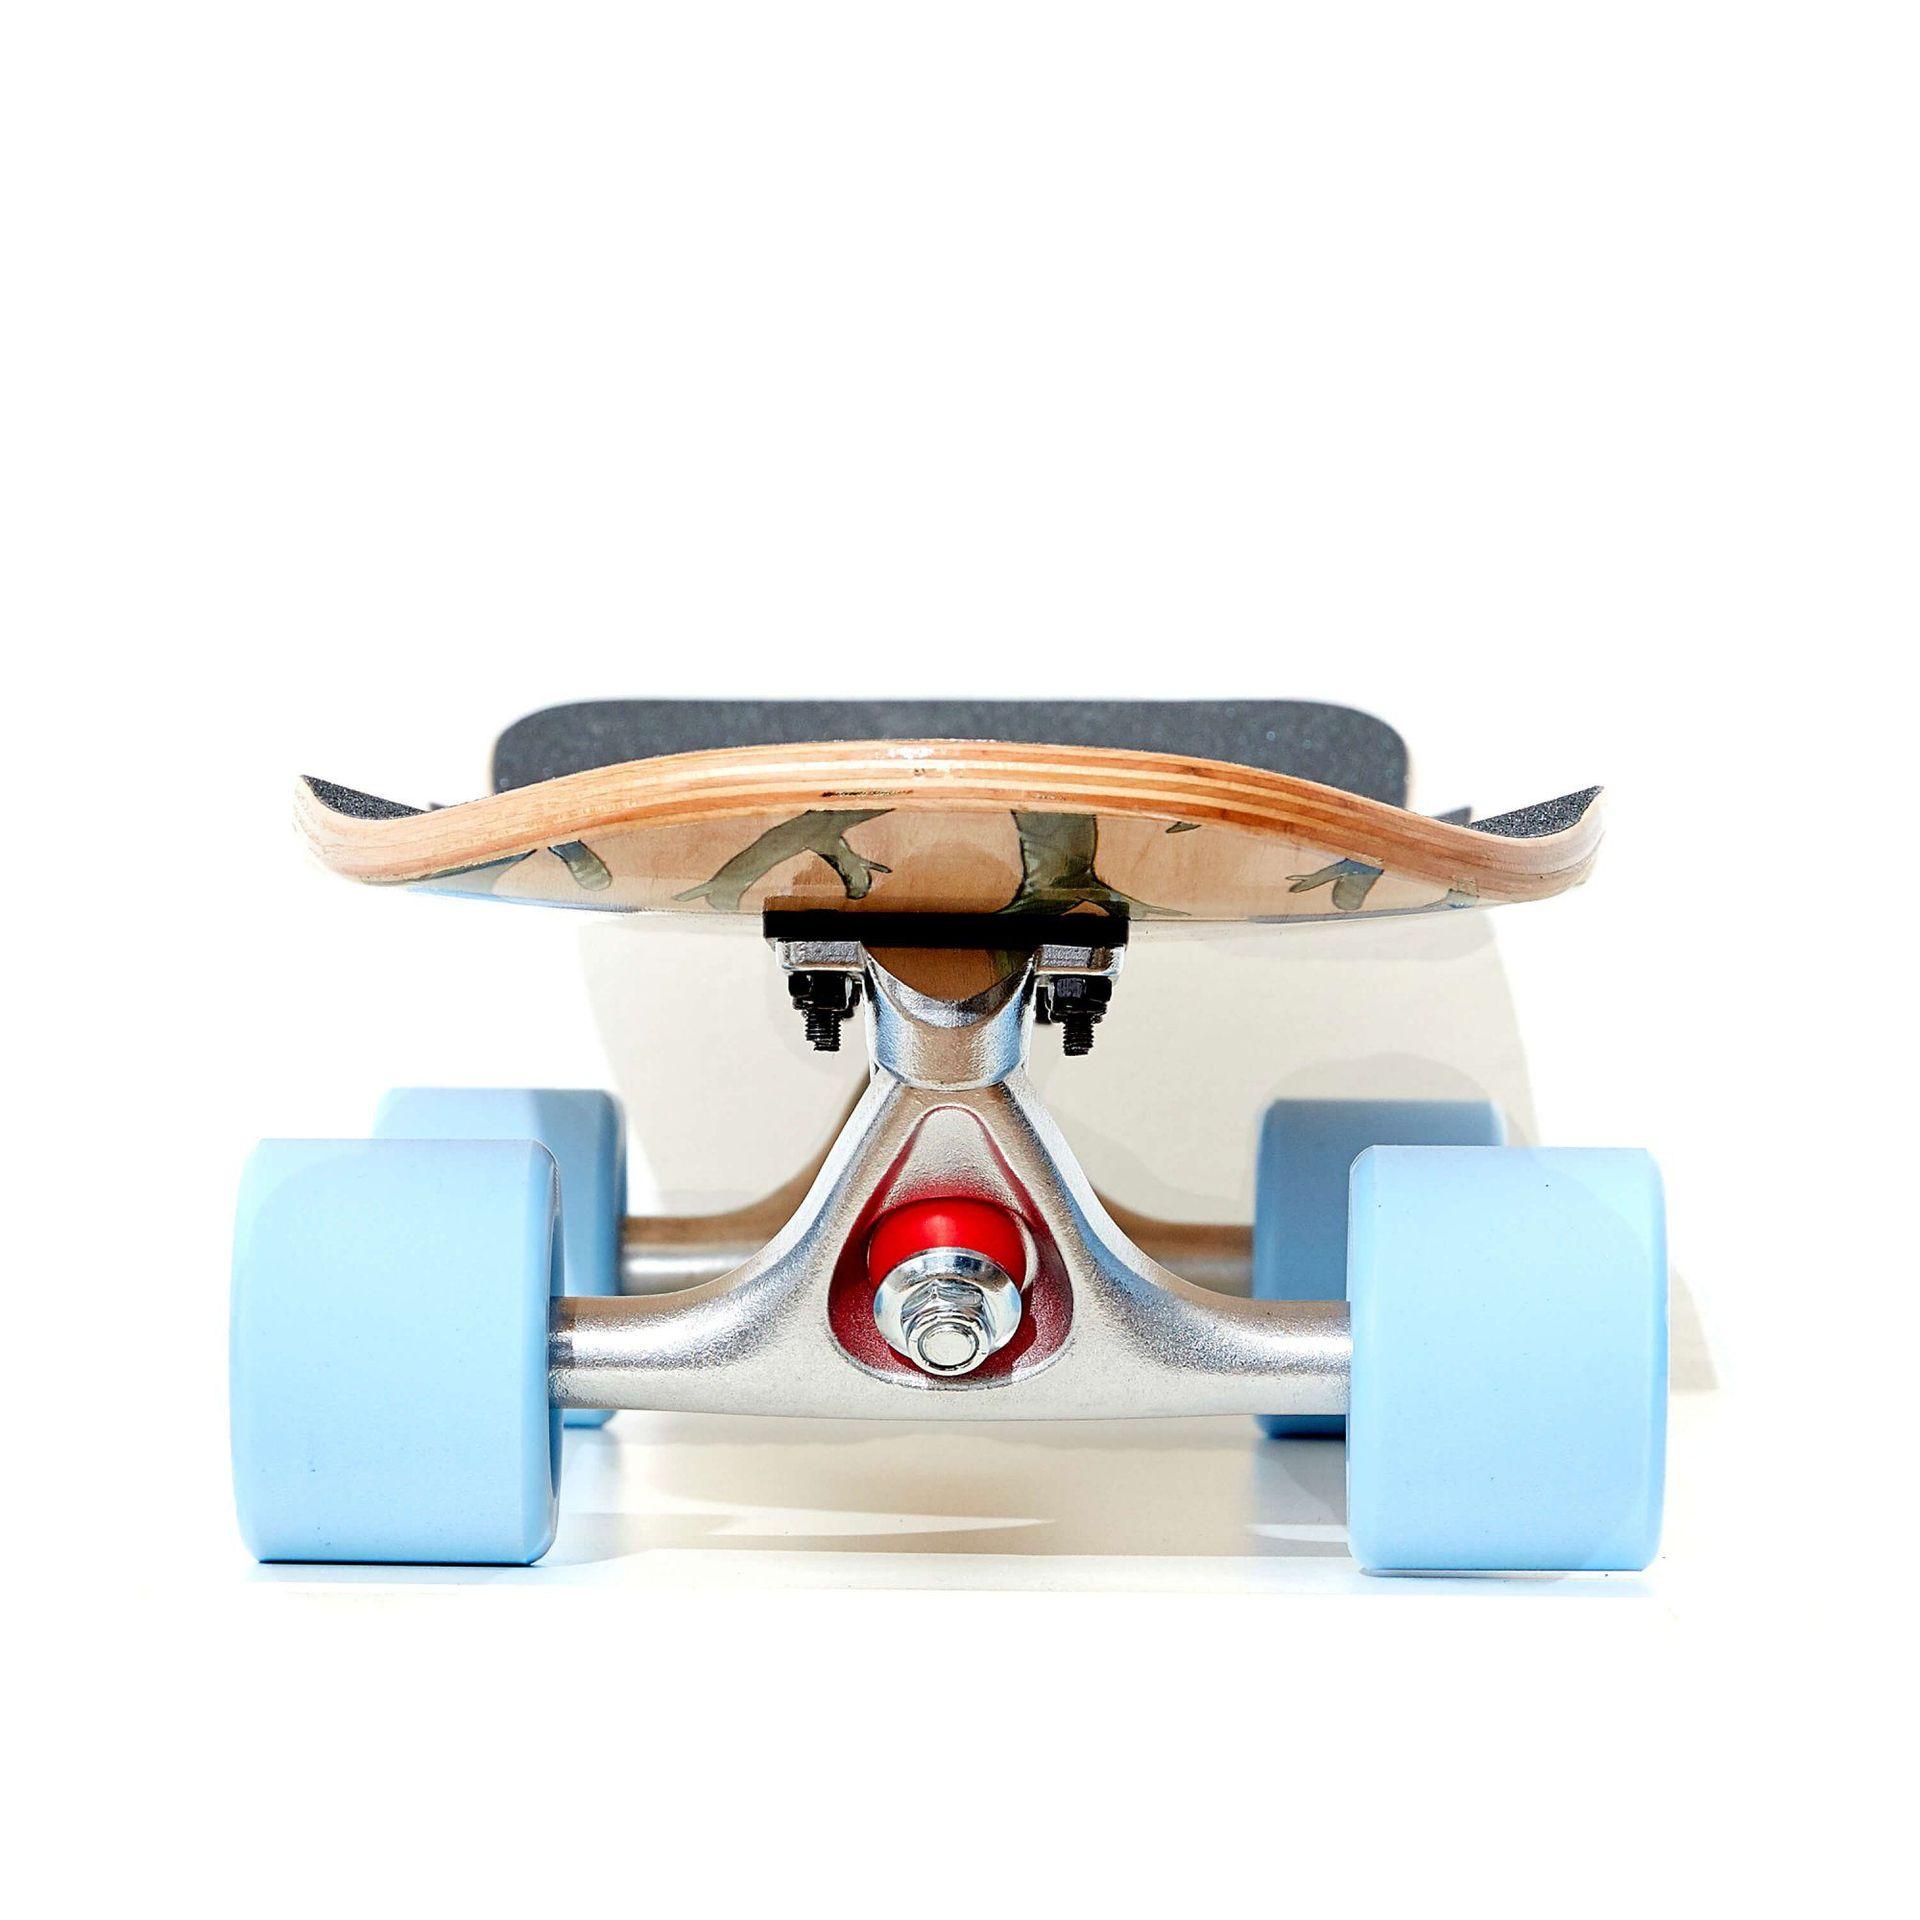 LONGBOARD FISH SKATEBOARDS CRUISER 32 SEADRAGON|SILVER|SUMMER BLUE 2